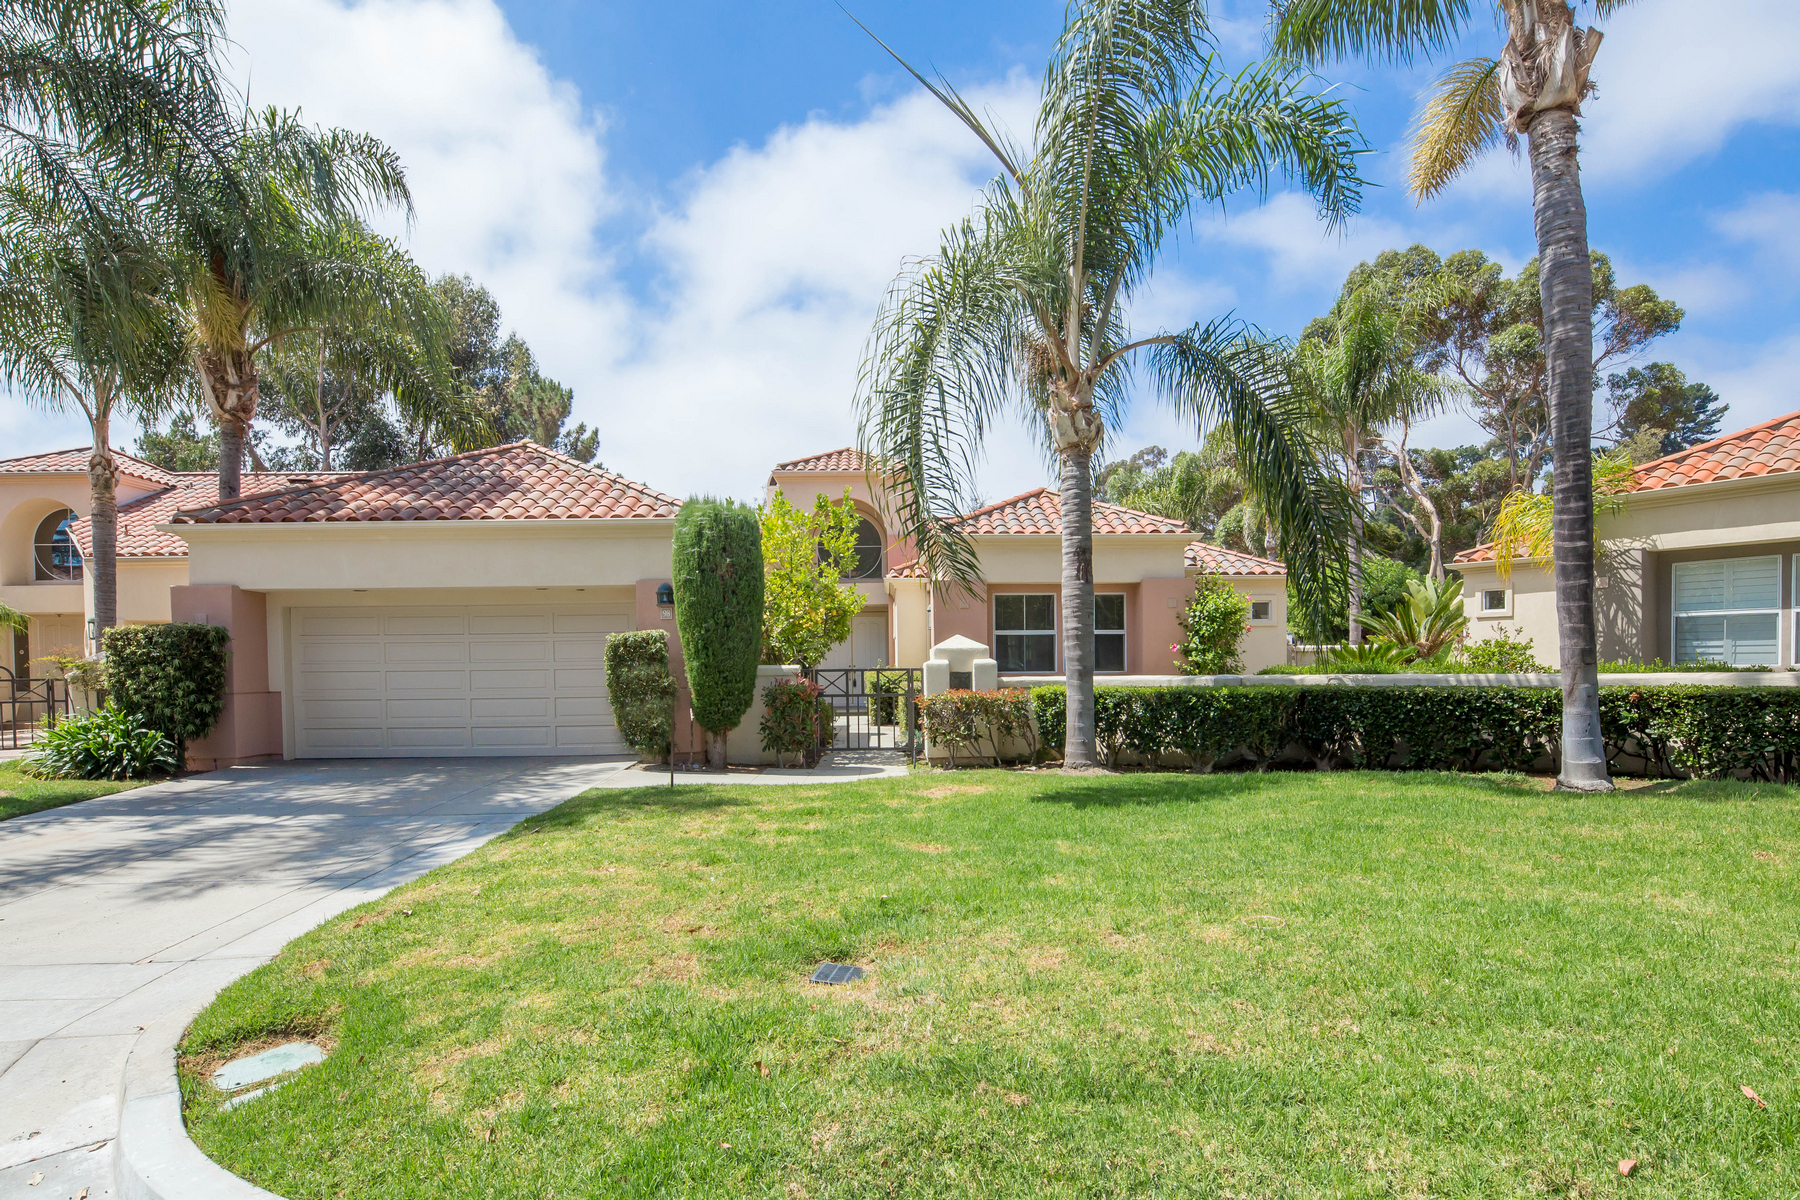 Single Family Homes for Sale at 98 Siena Laguna Niguel, California 92677 United States